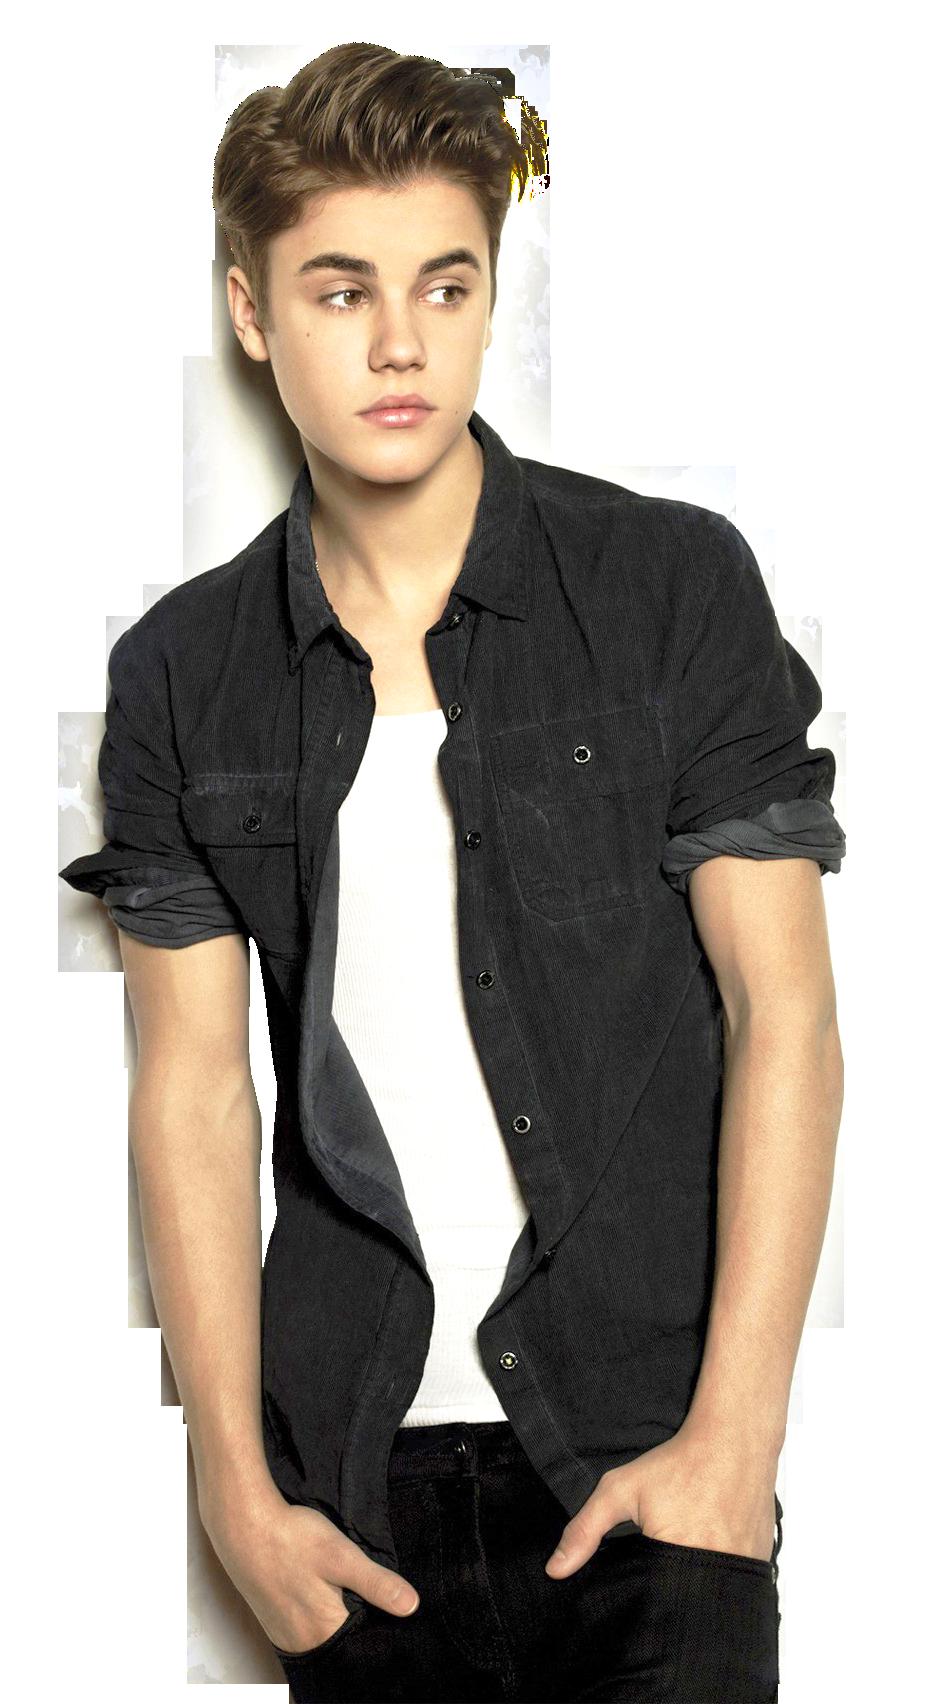 Pin By Julian On Justin Bieber Png Justin Bieber Believe Justin Bieber Justin Bieber Wallpaper